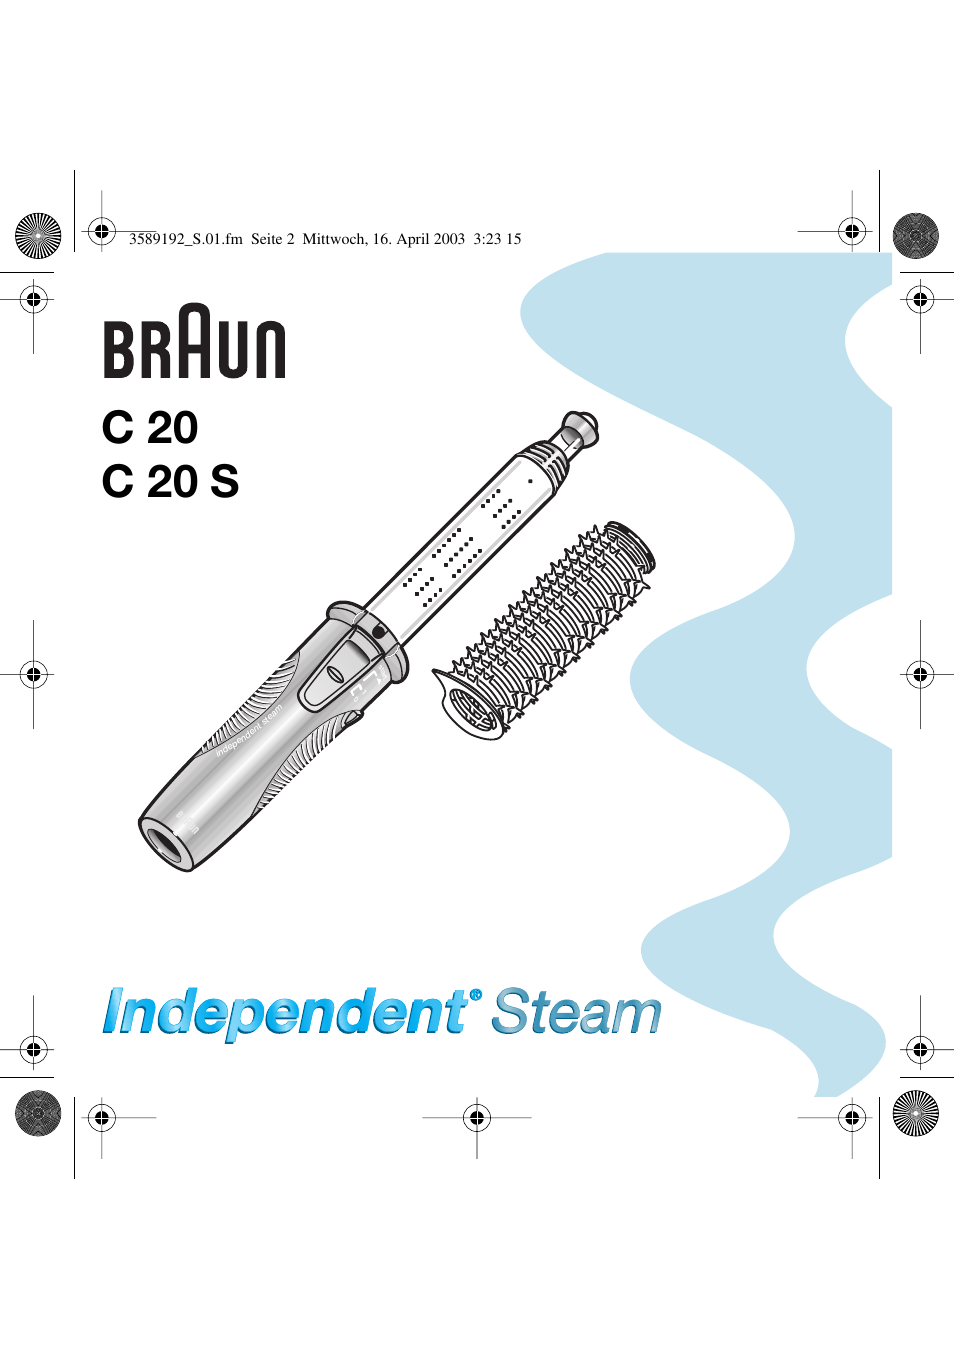 Braun C20 Independent Steam User Manual